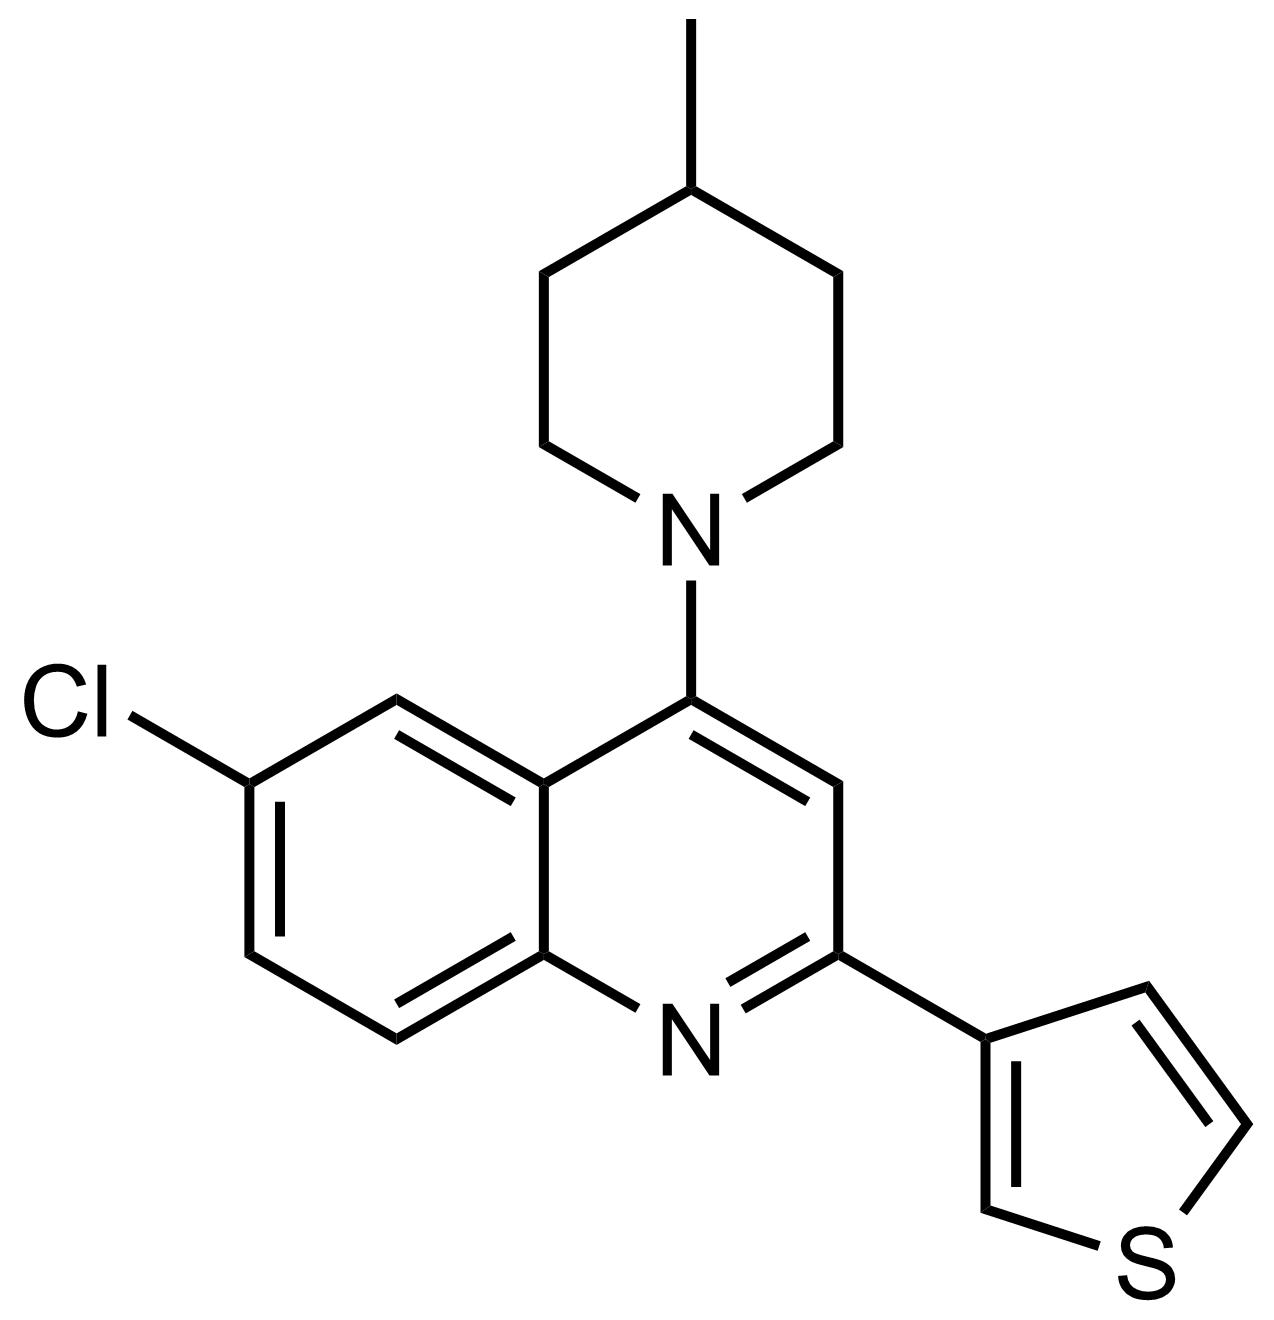 Structure of 6-Chloro-4-(4-methylpiperidin-1-yl)-2-(thiophen-3-yl)quinoline